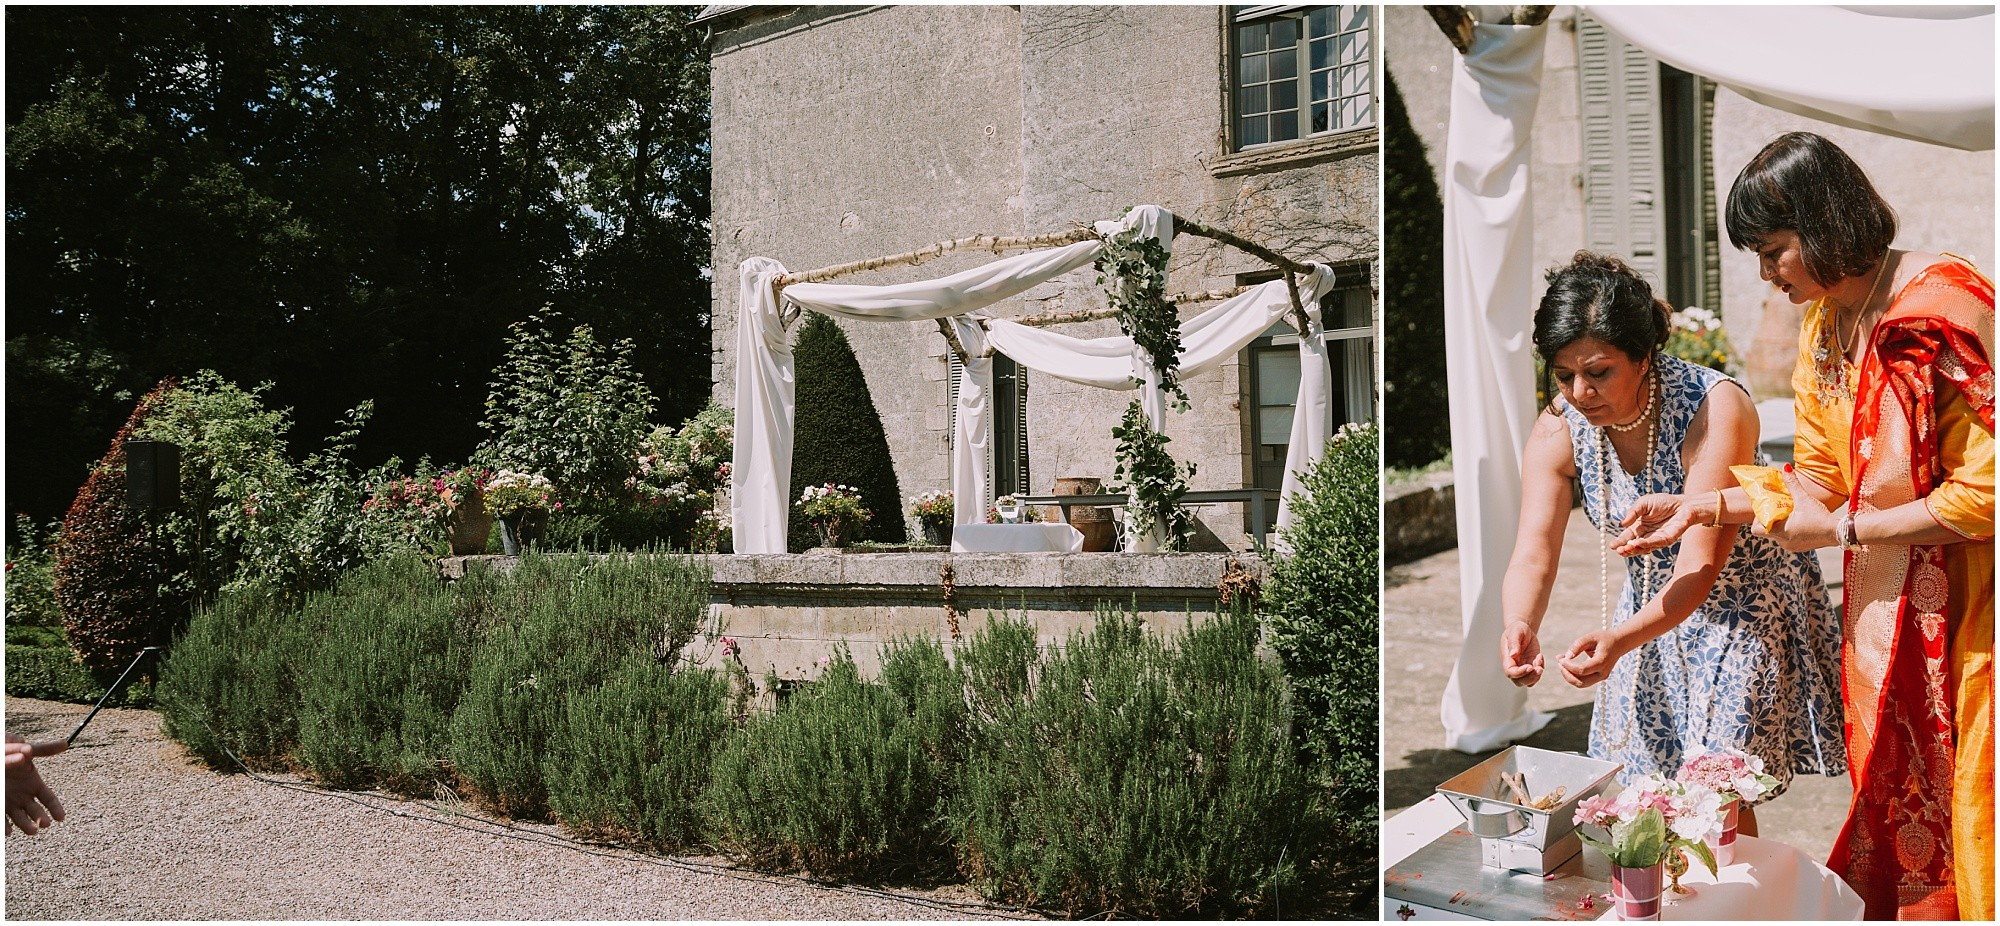 Kateryna-photos-photographer-mariage-chateau-saint-paterne-alencon-normandie-mayenne-le-mans_0055.jpg